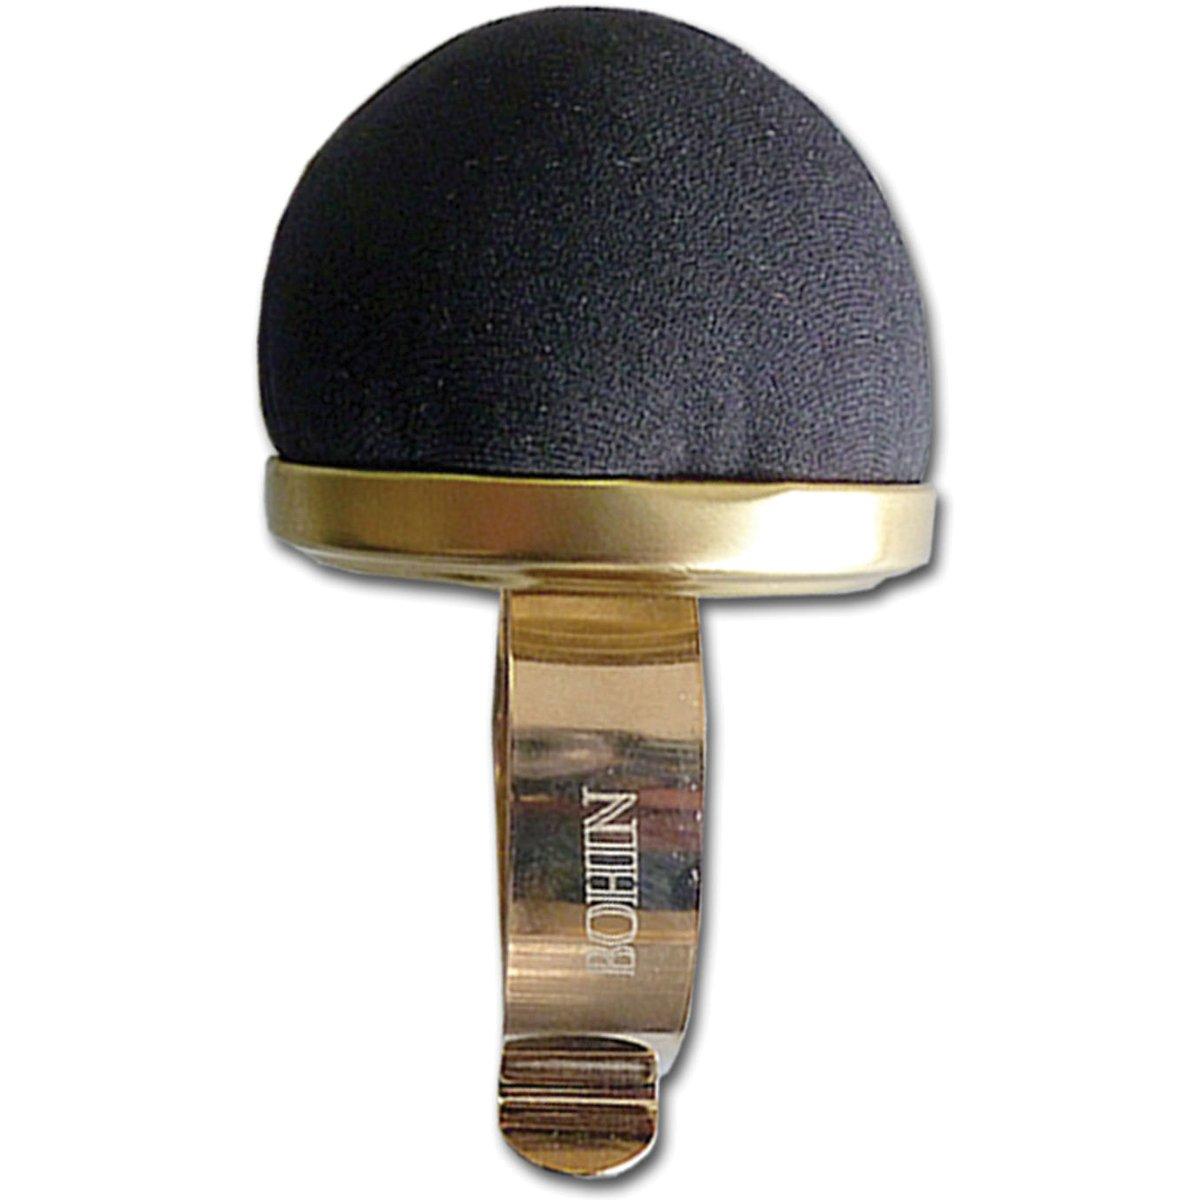 Bohin Wrist Pincushion, Black Velvet 75590